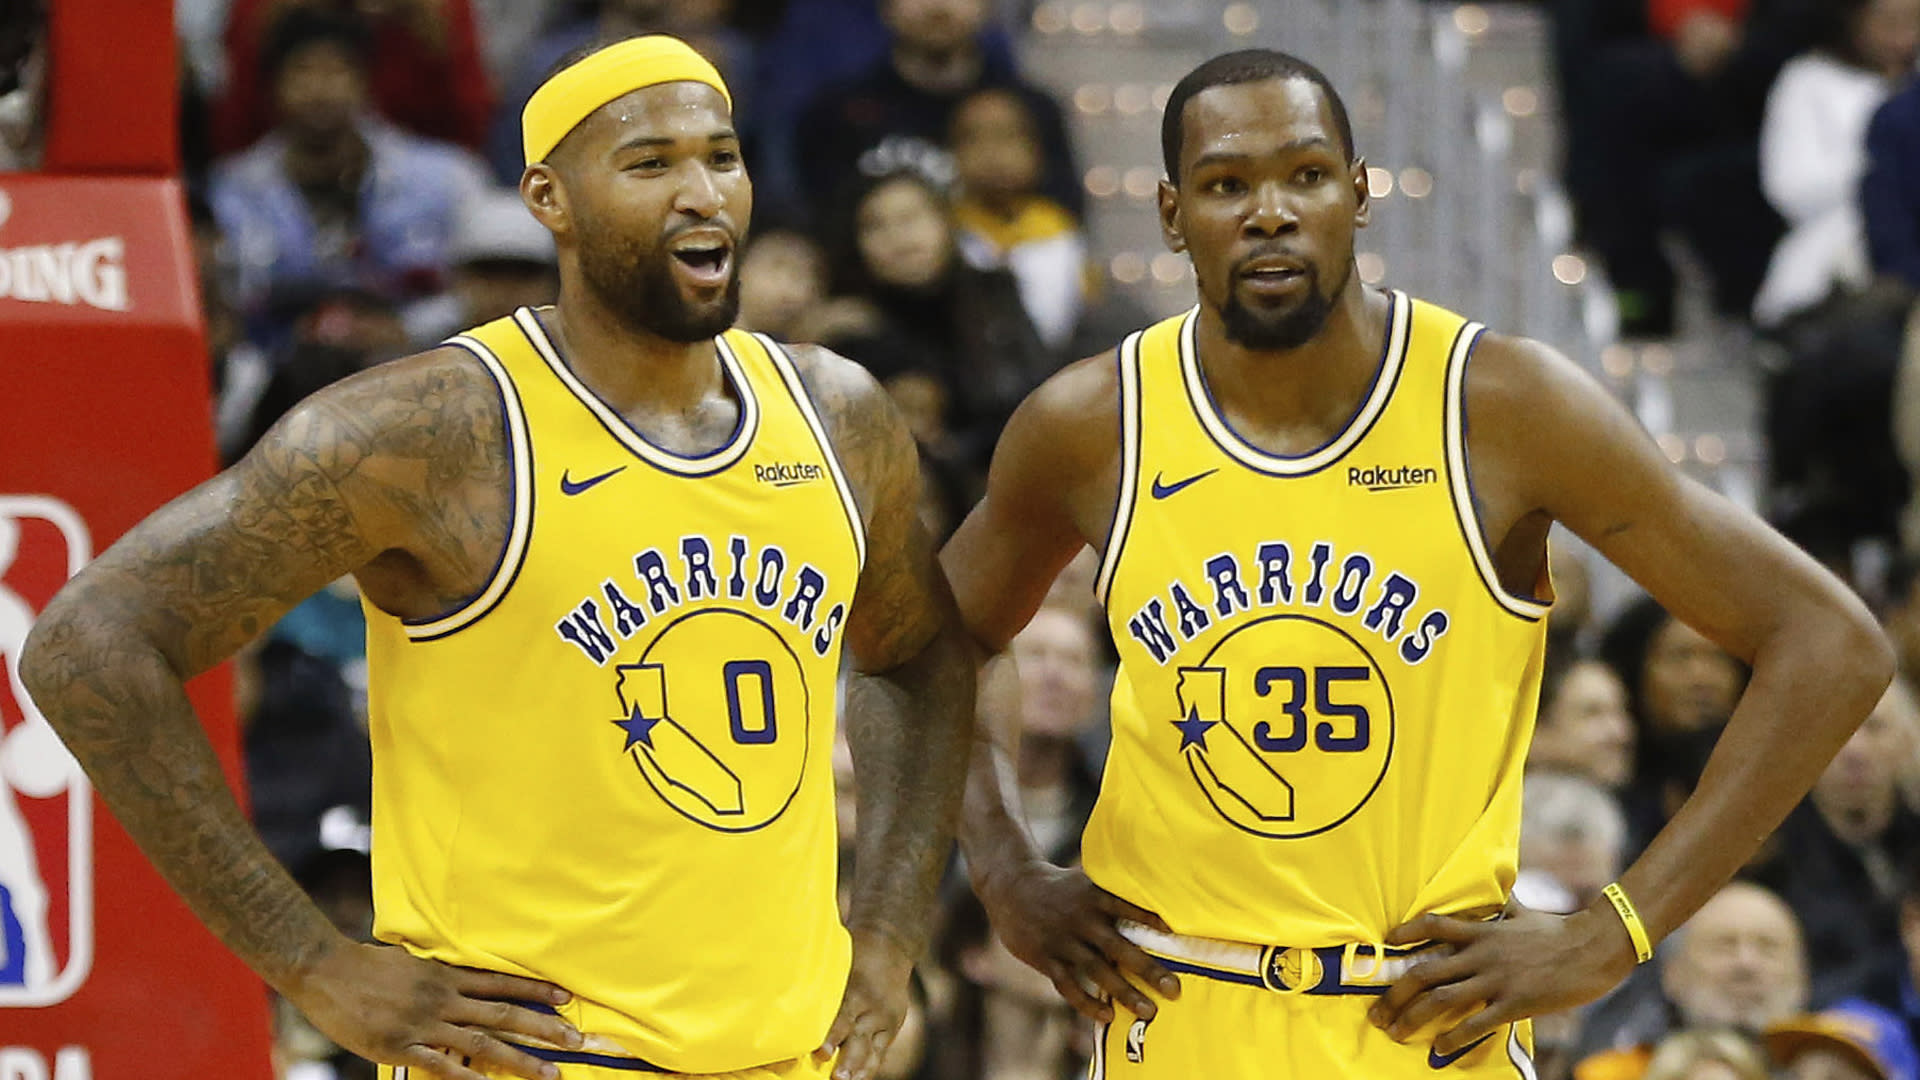 DeMarcus Cousins closer to making Warriors return than Kevin Durant